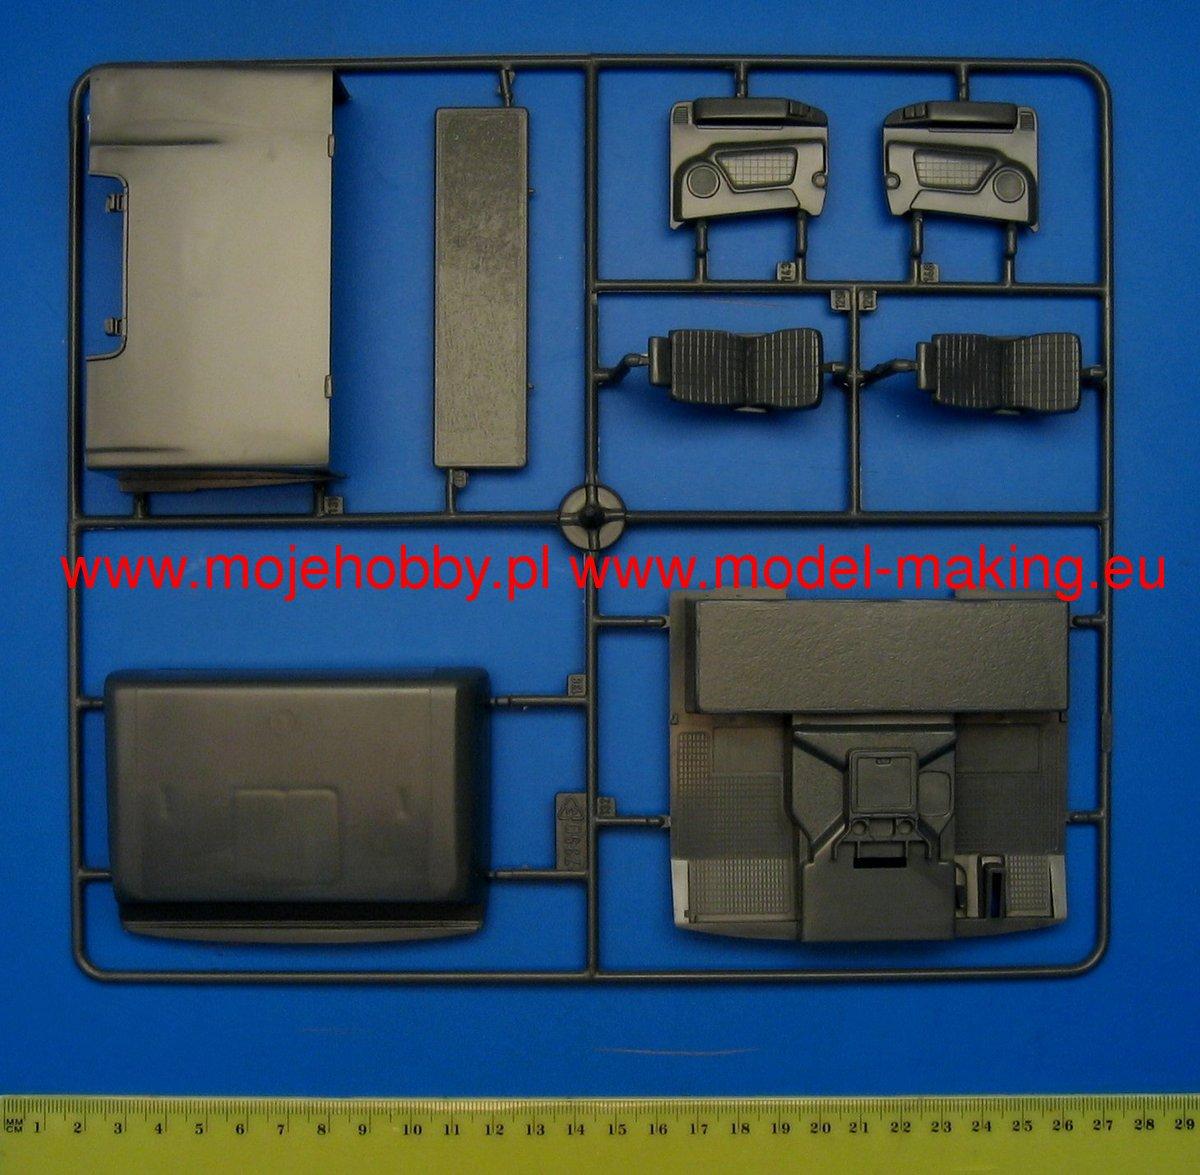 italeri 3840 - volvo fh-12 xl70